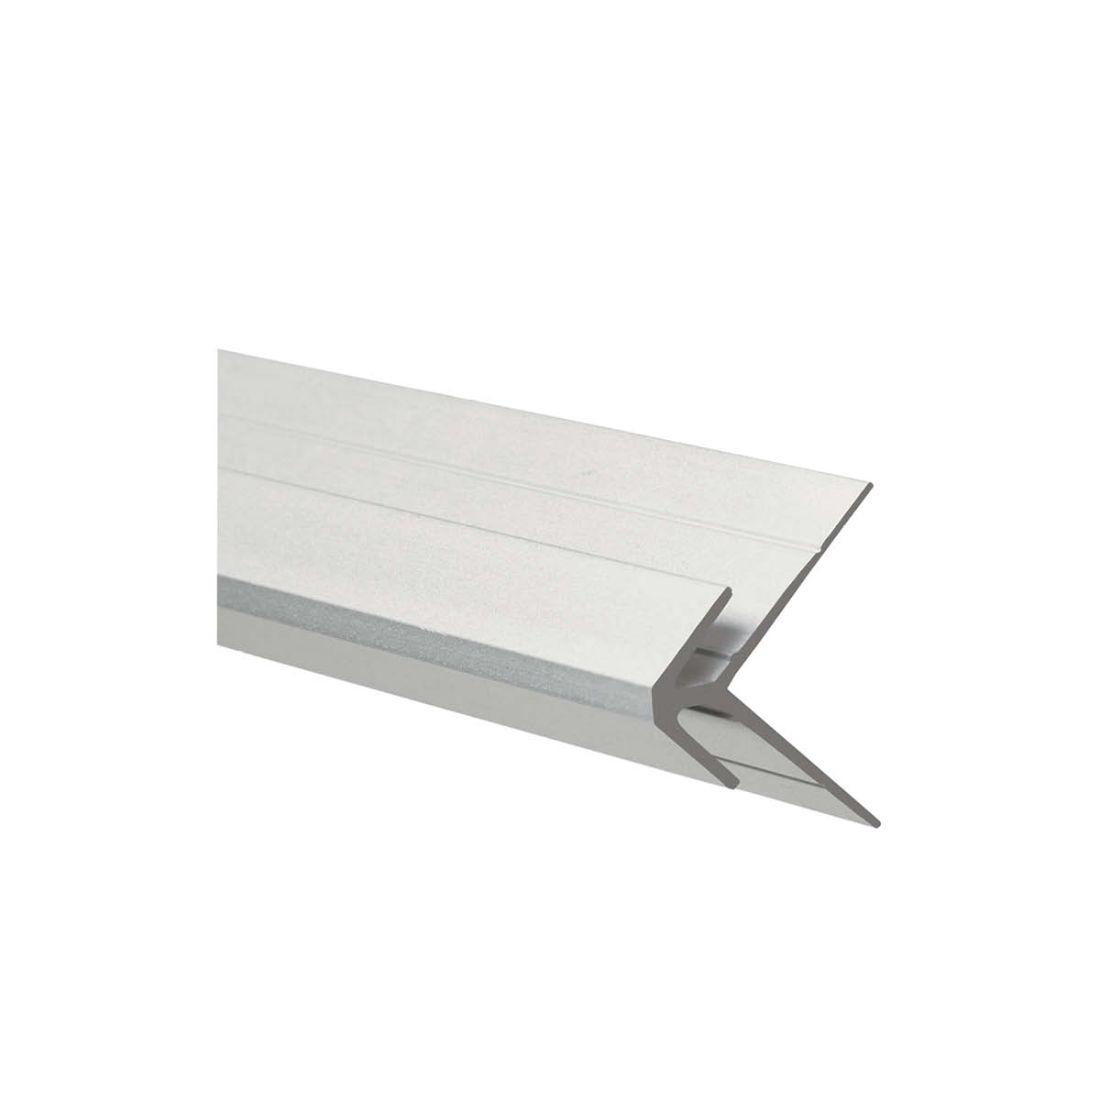 Aluminium External Corner Jointer Moonshine 2700 x 4.5mm